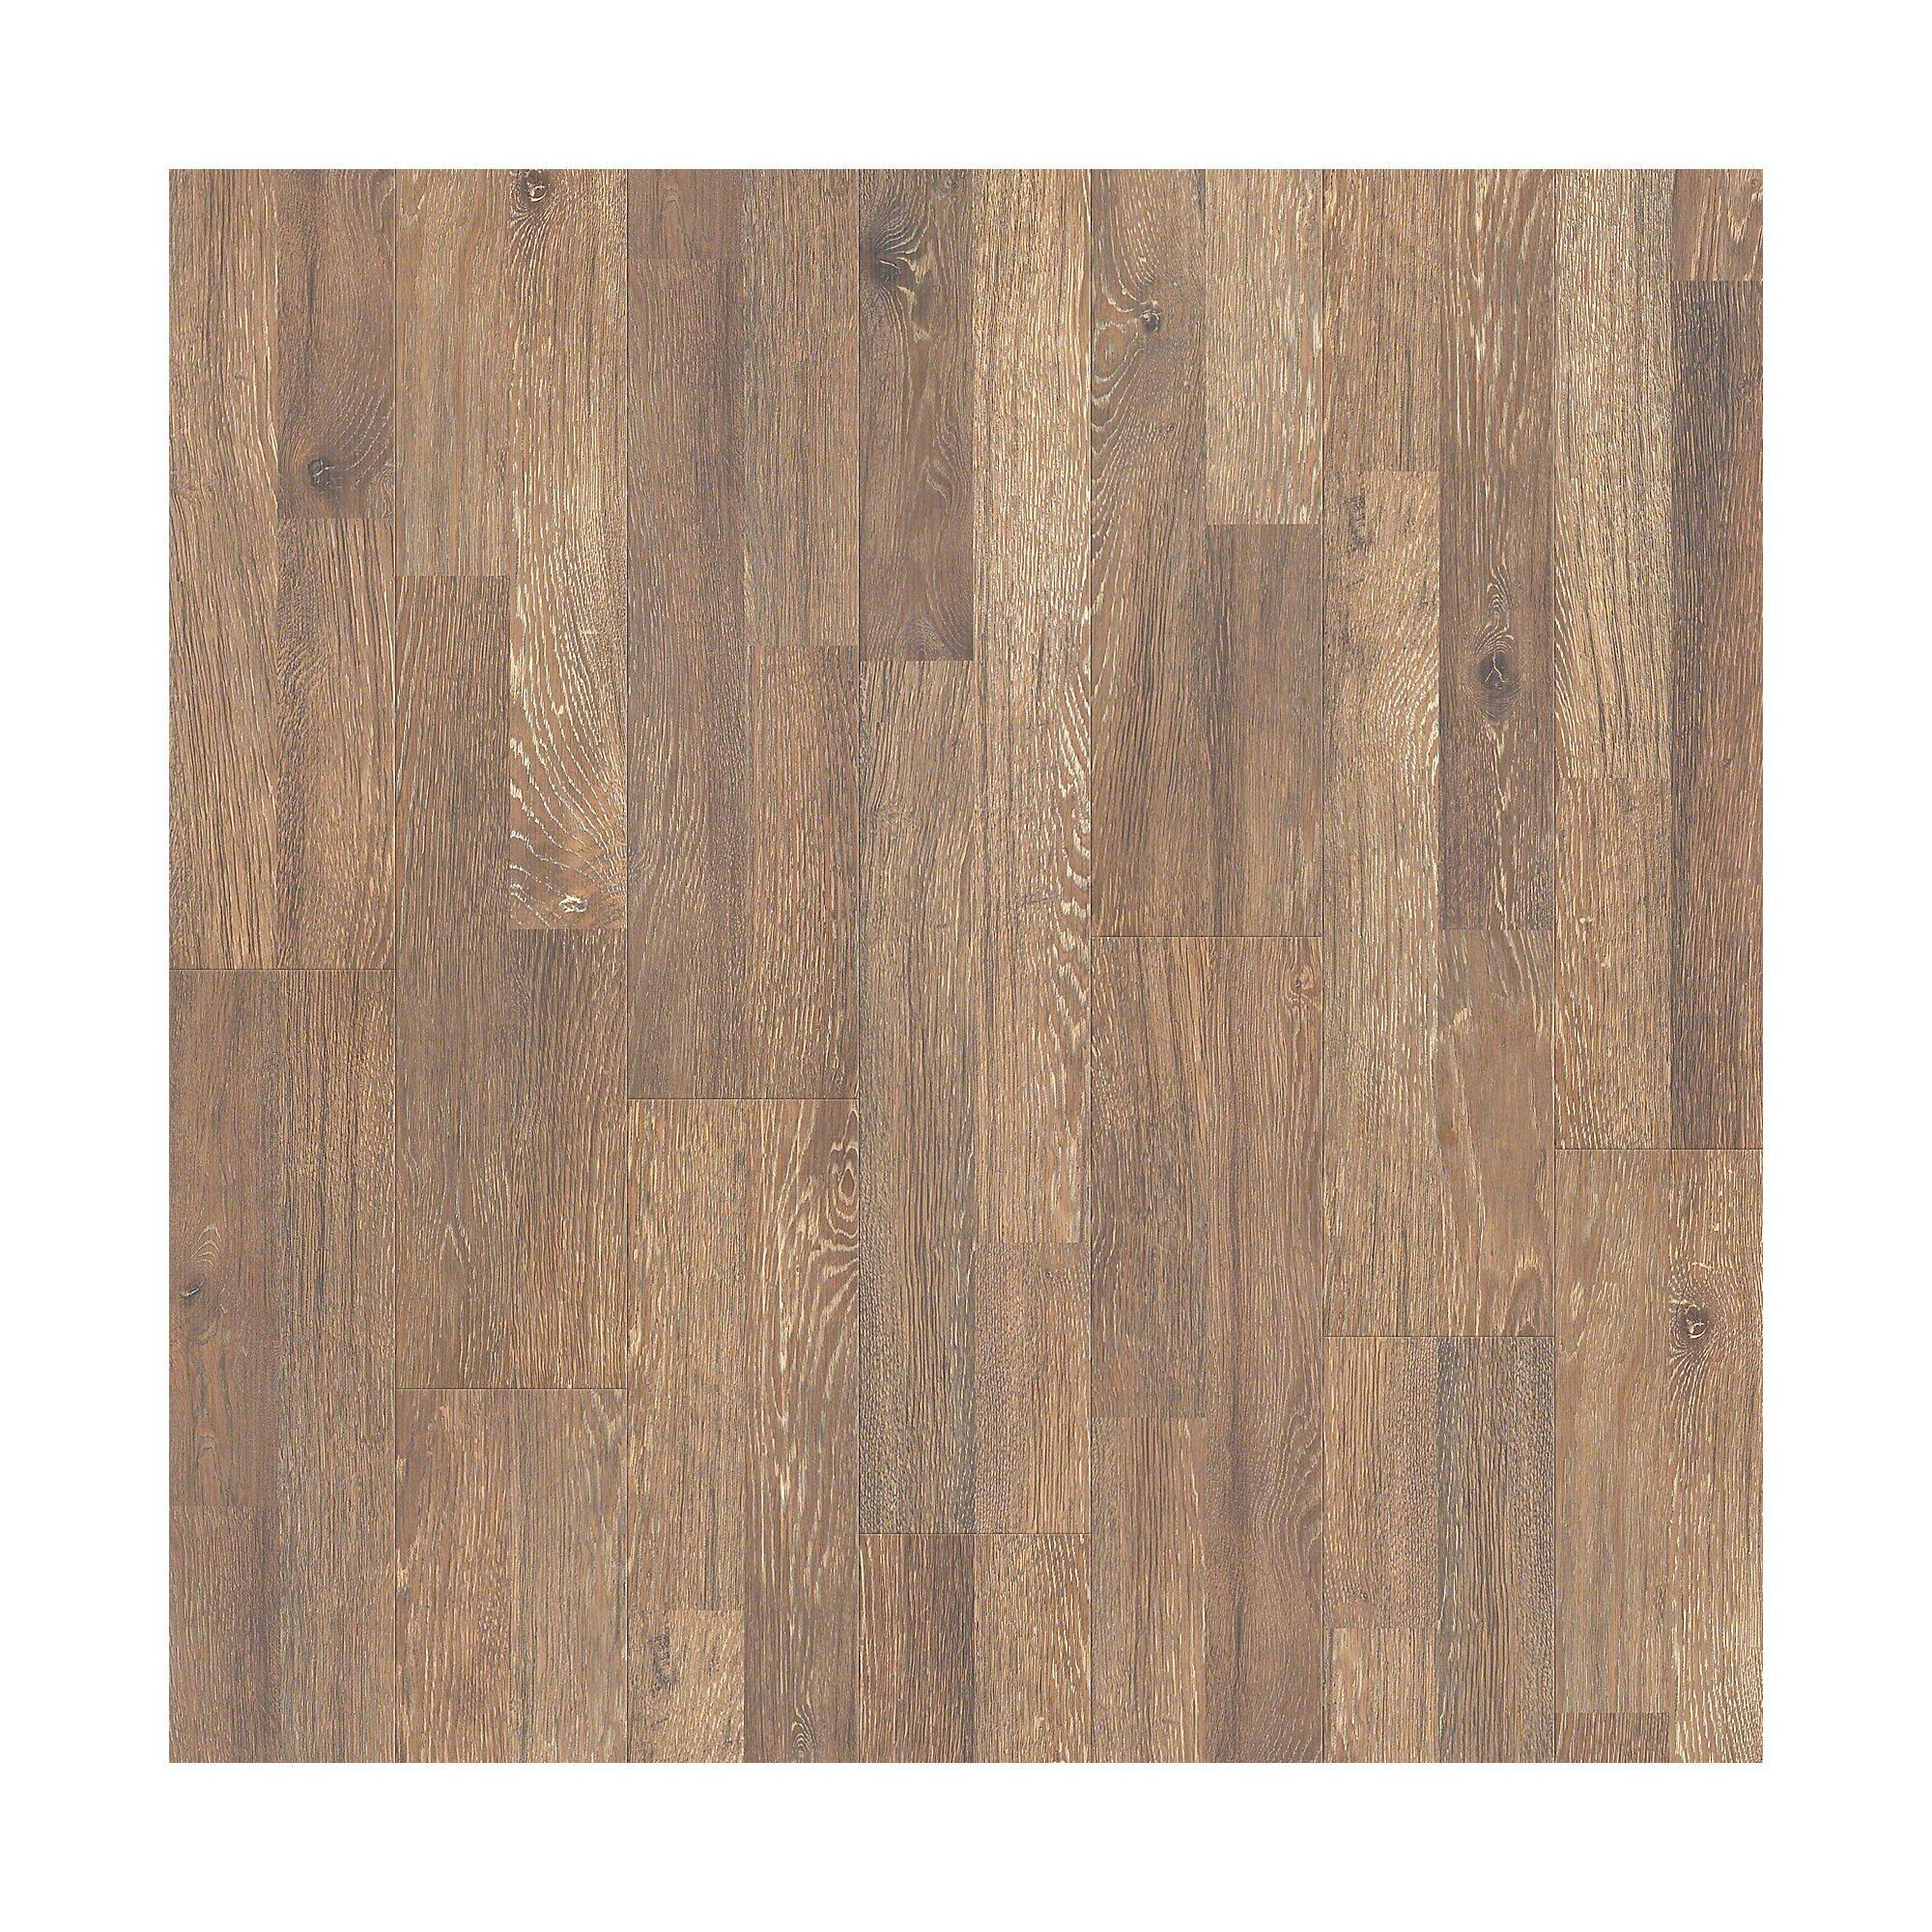 8mm Laminate Flooring prestige oak grey 8mm v groove laminate flooring Reclaimed Plus Belvoir 8 X 48 X 8mm Laminate